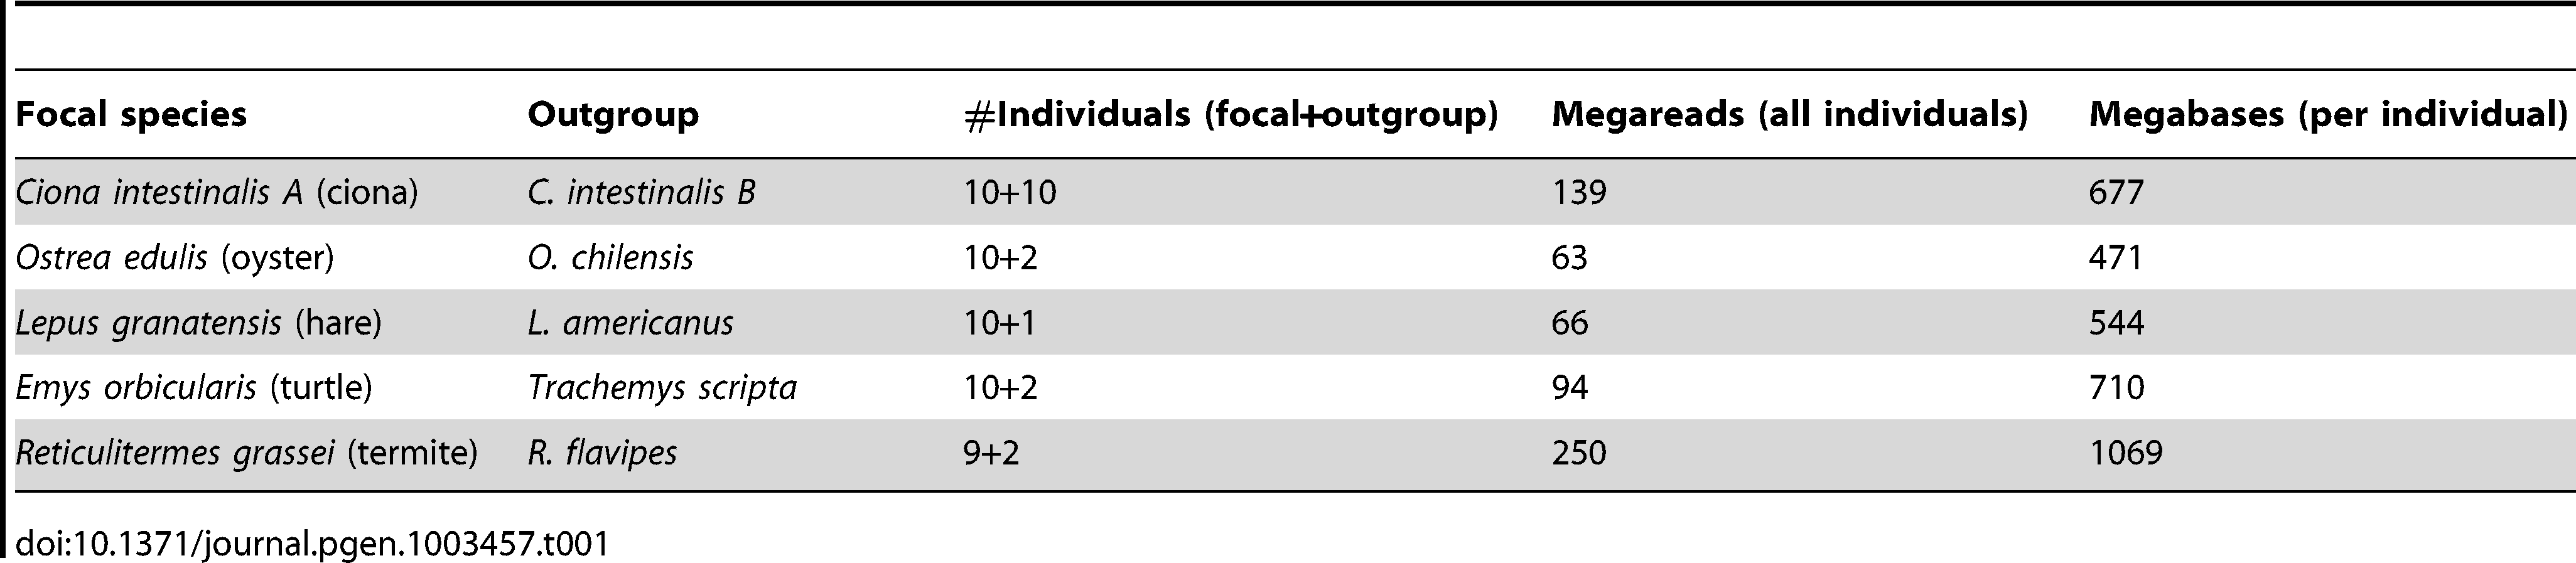 Illumina data sets used in this study.